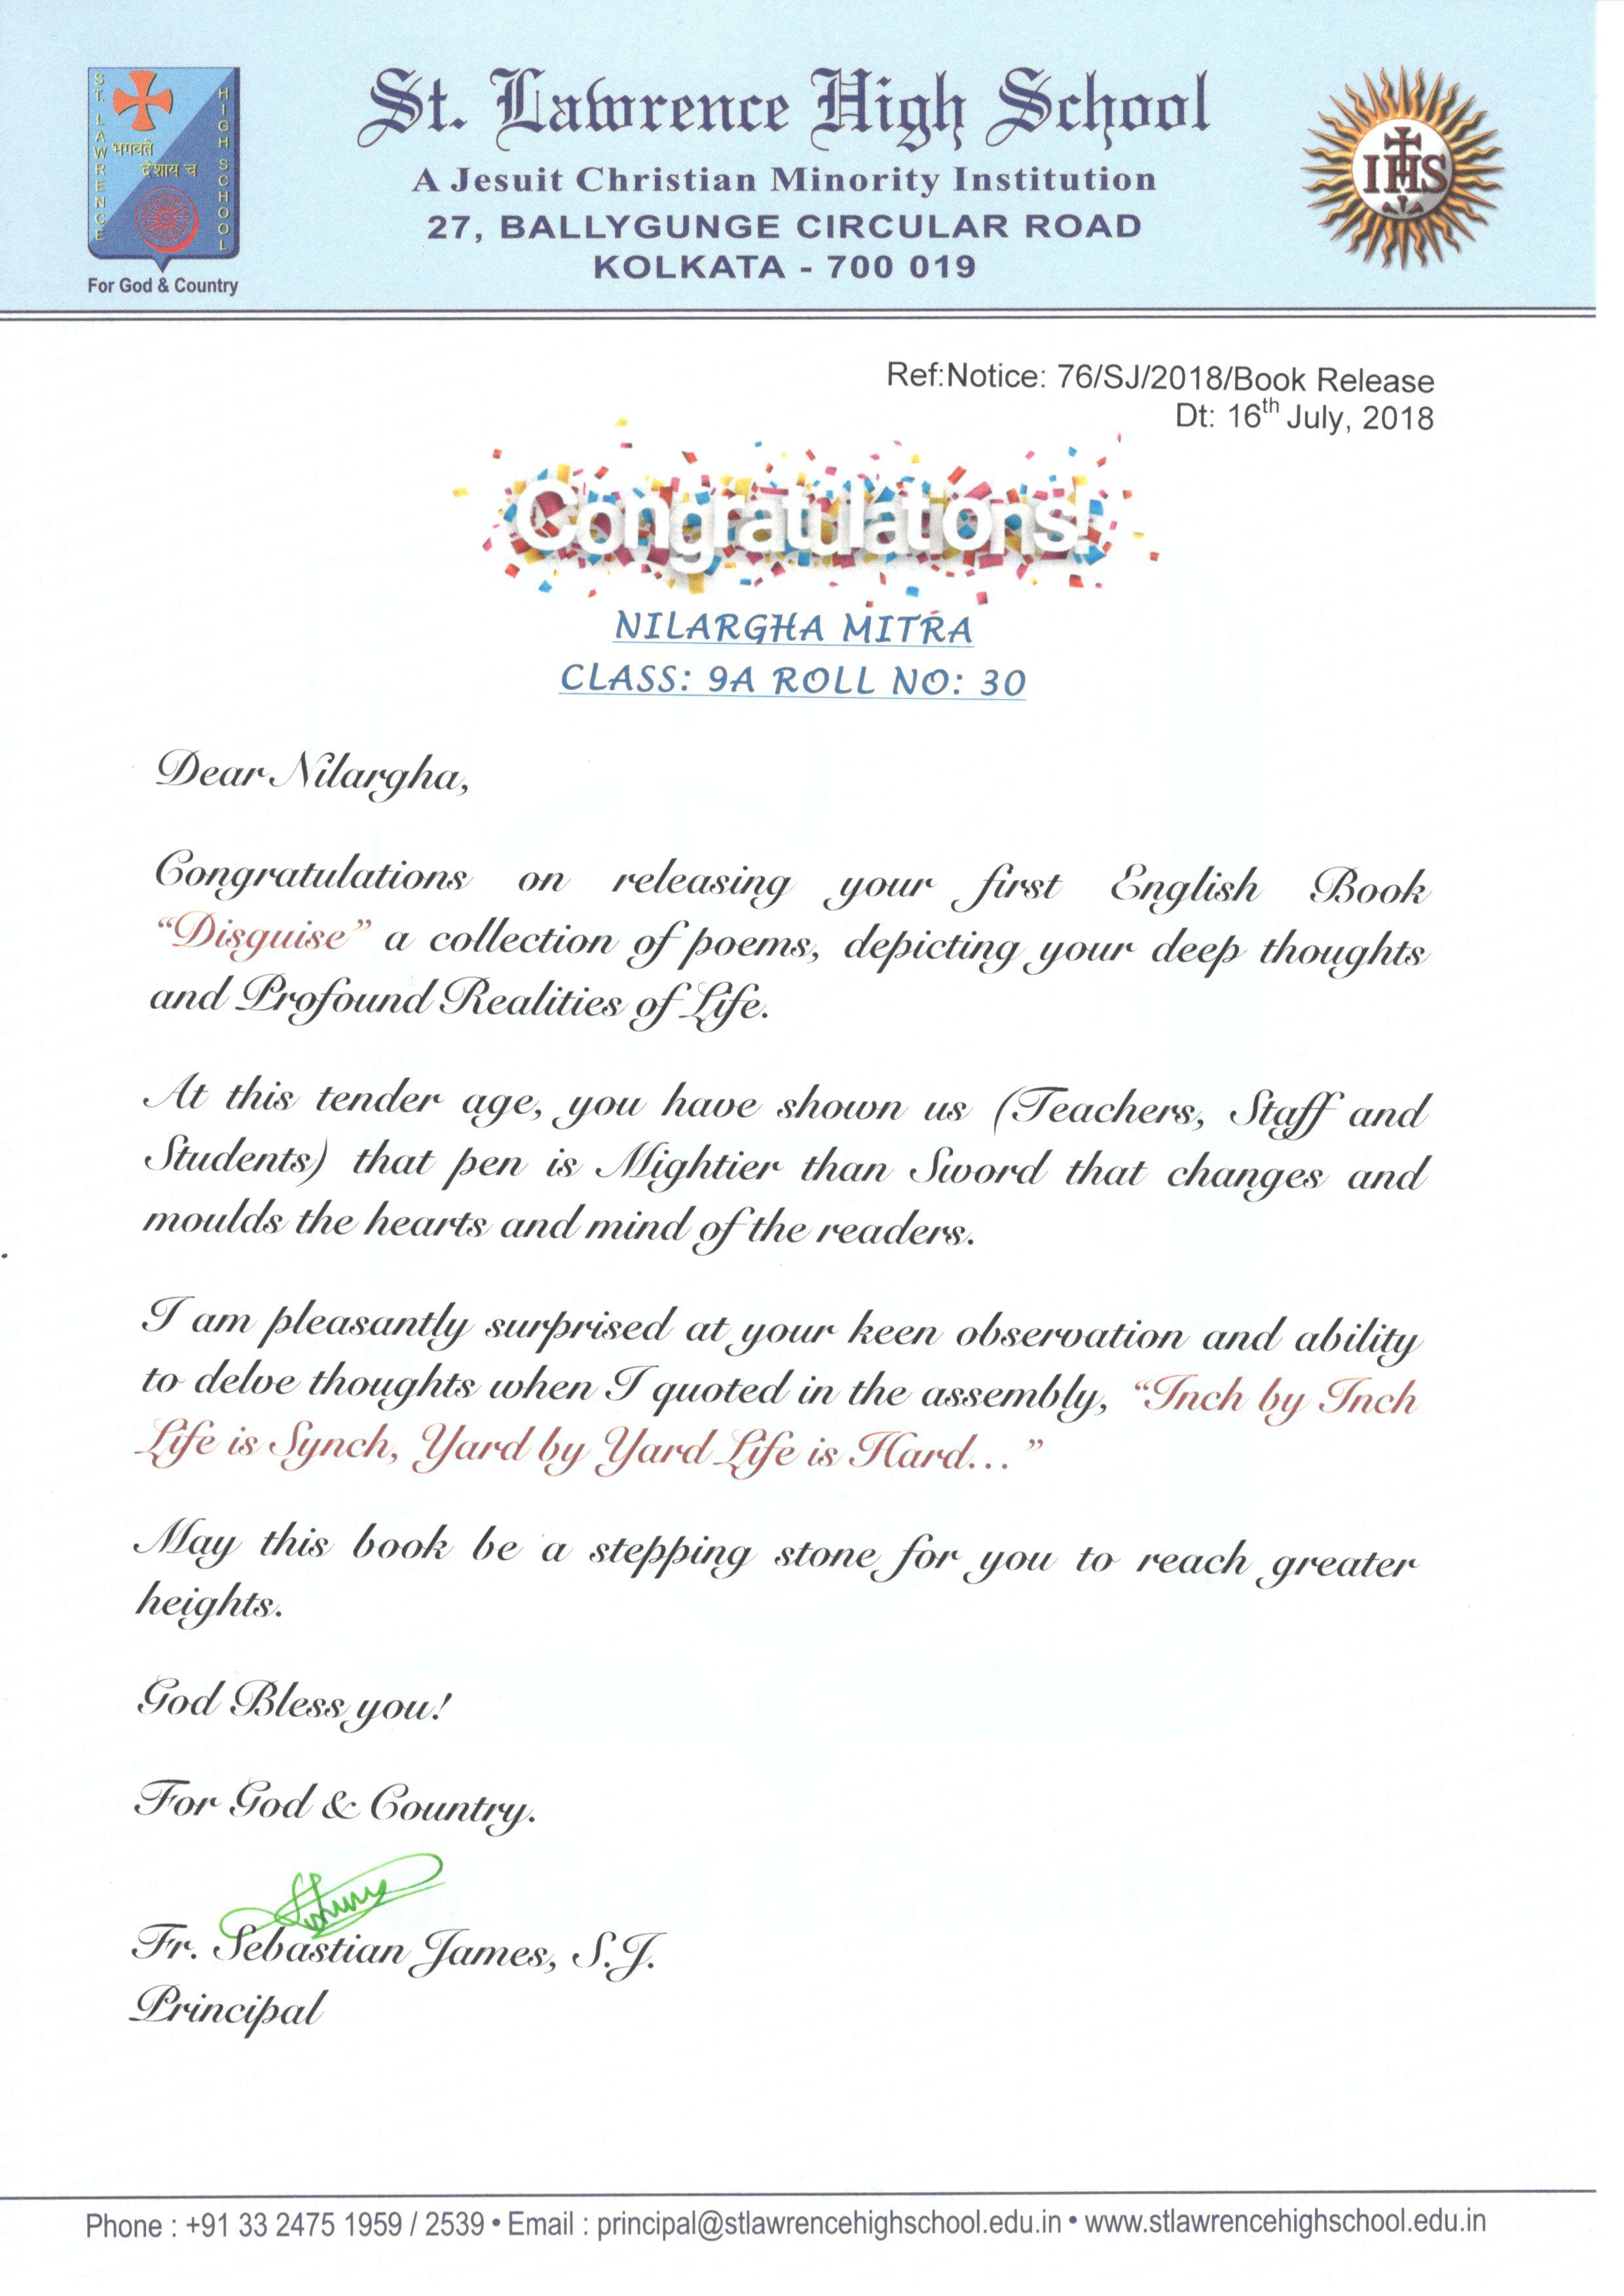 Congratulation - Nilargha Mitra